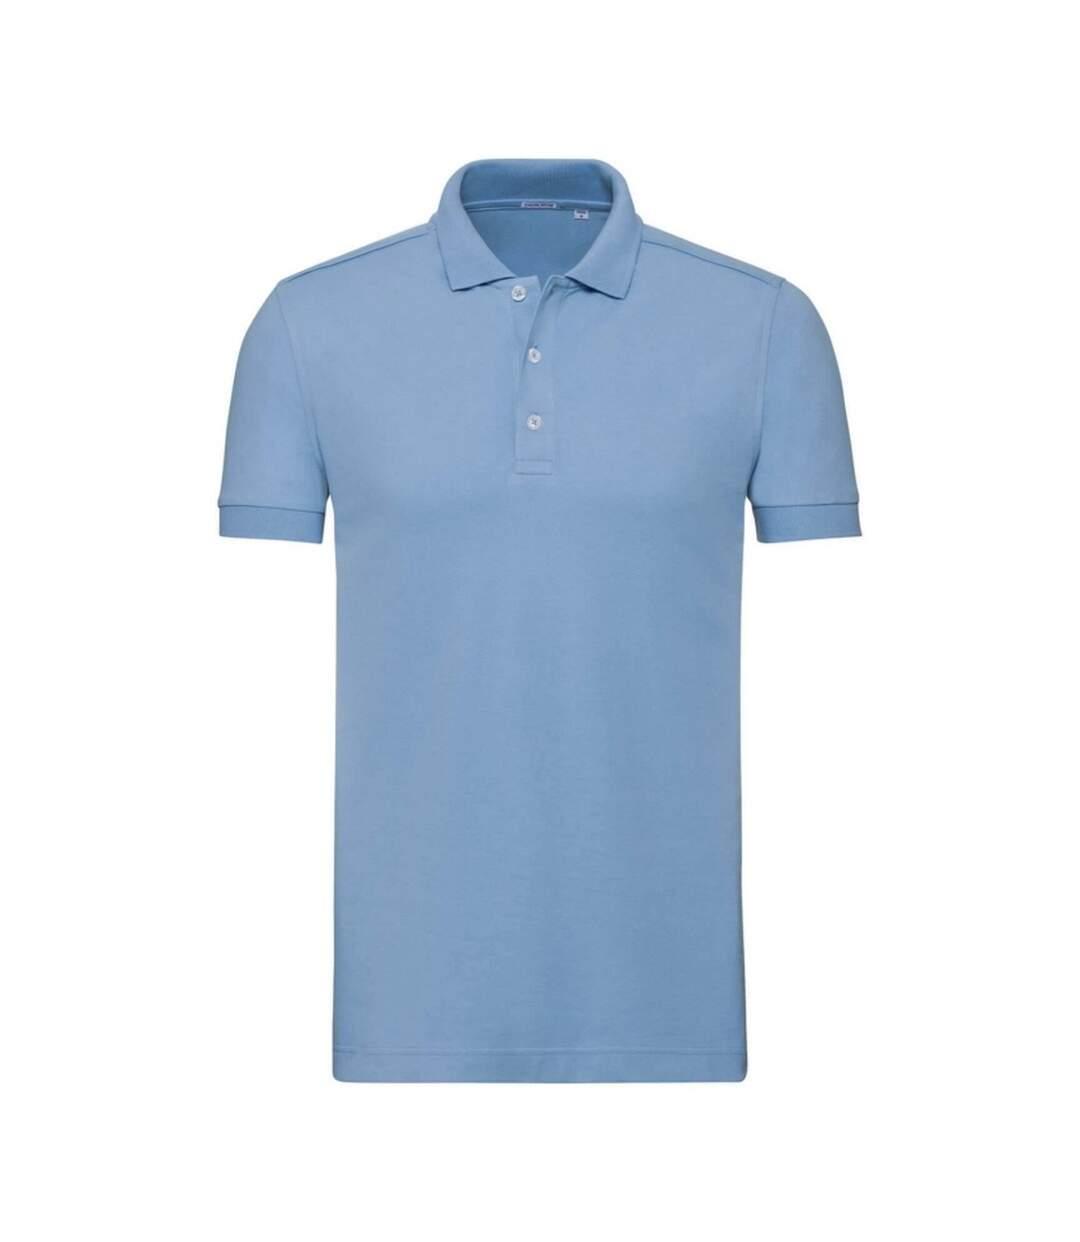 Russell Mens Stretch Short Sleeve Polo Shirt (Sky Blue) - UTBC3257